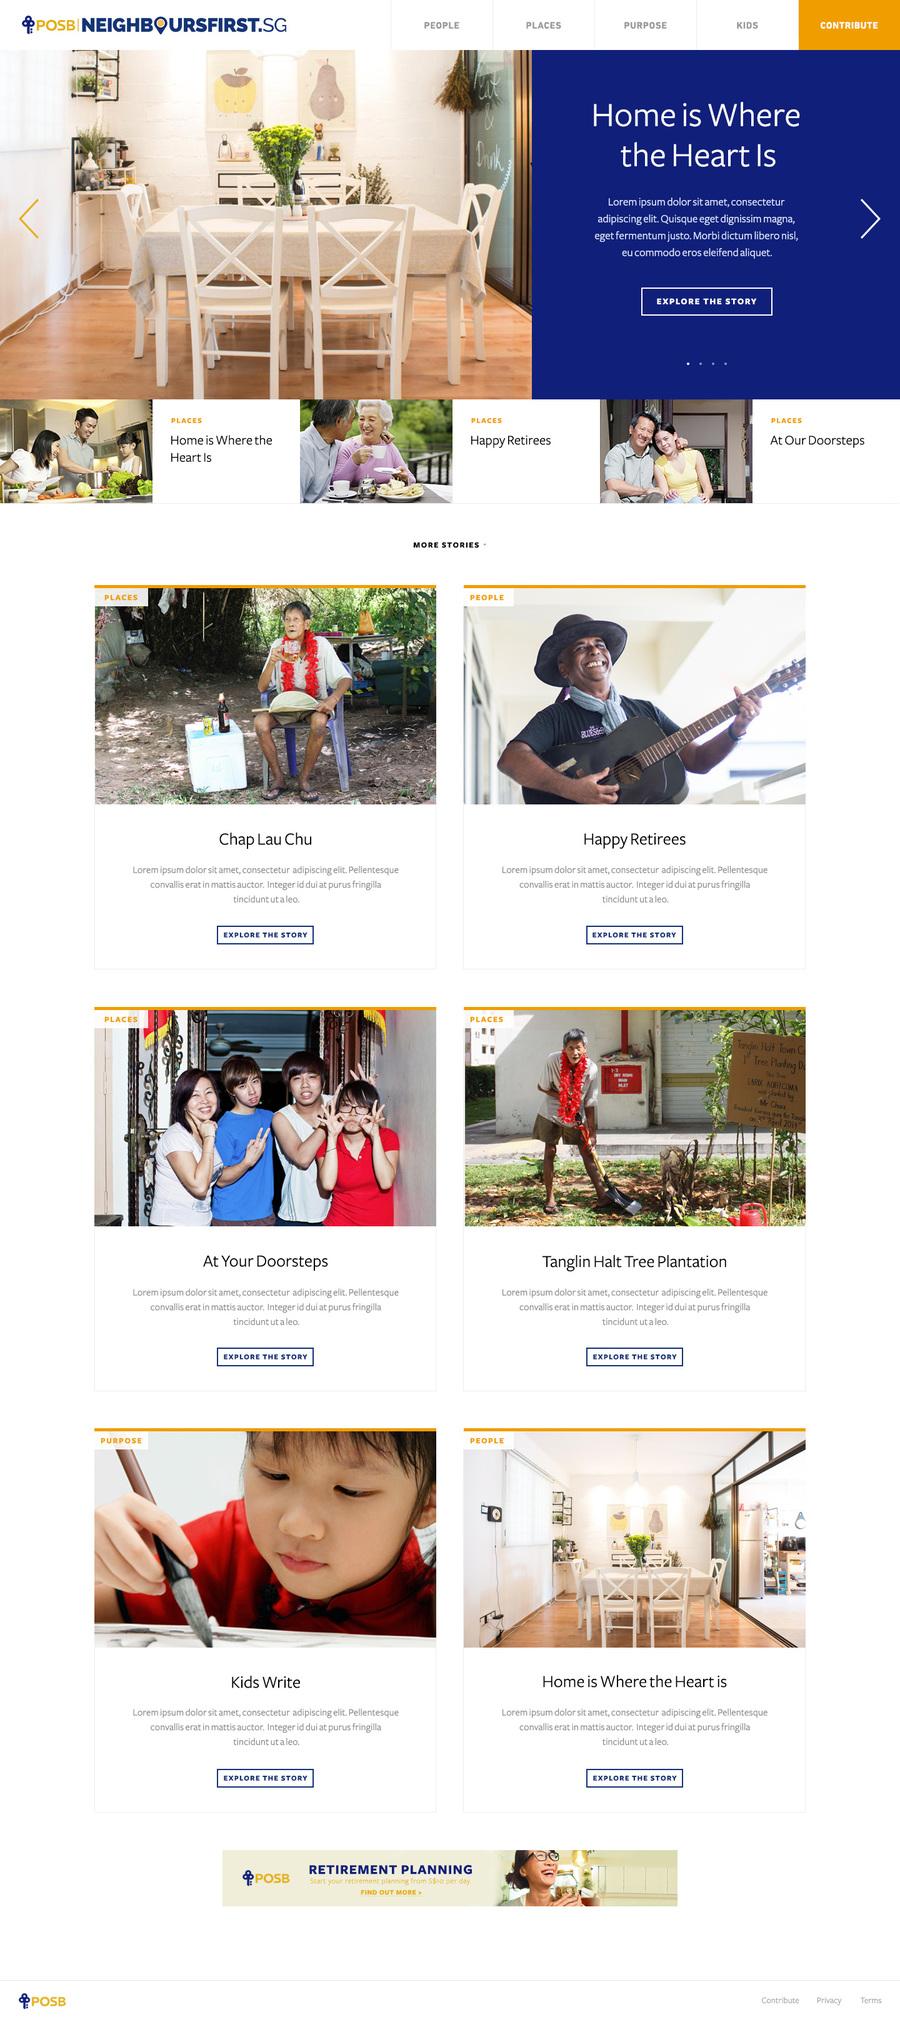 A great web design by Fixx Digital, Singapore, Singapore: